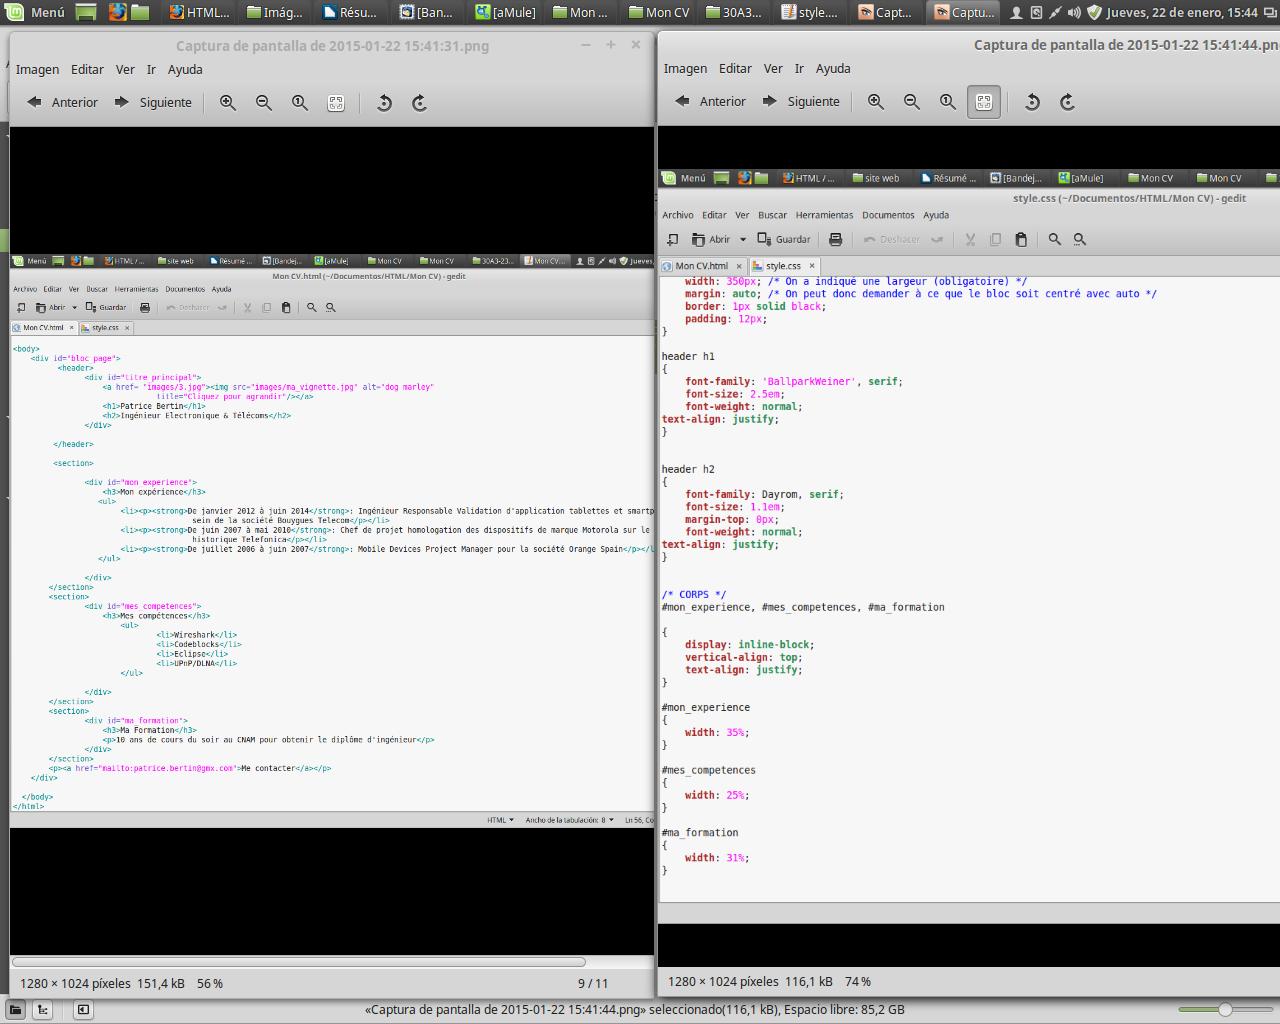 exercice partie 3 organiser son cv  html5 - css3  - inline-block par patrice94120